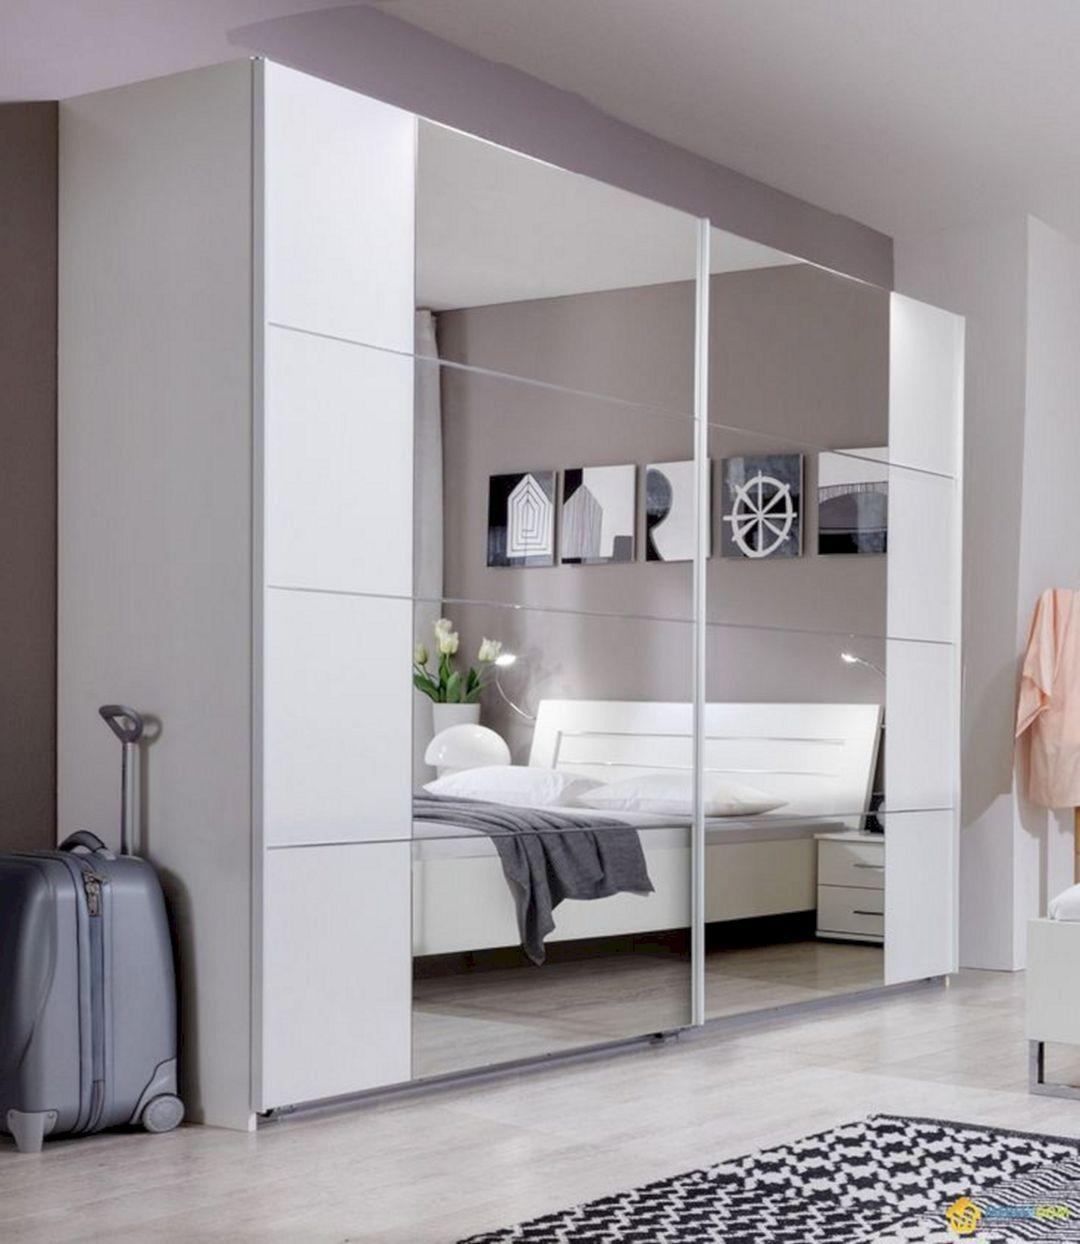 30 Modern Home Decor Ideas: 30 Modern Sliding Door Design For Your Home Inspiration